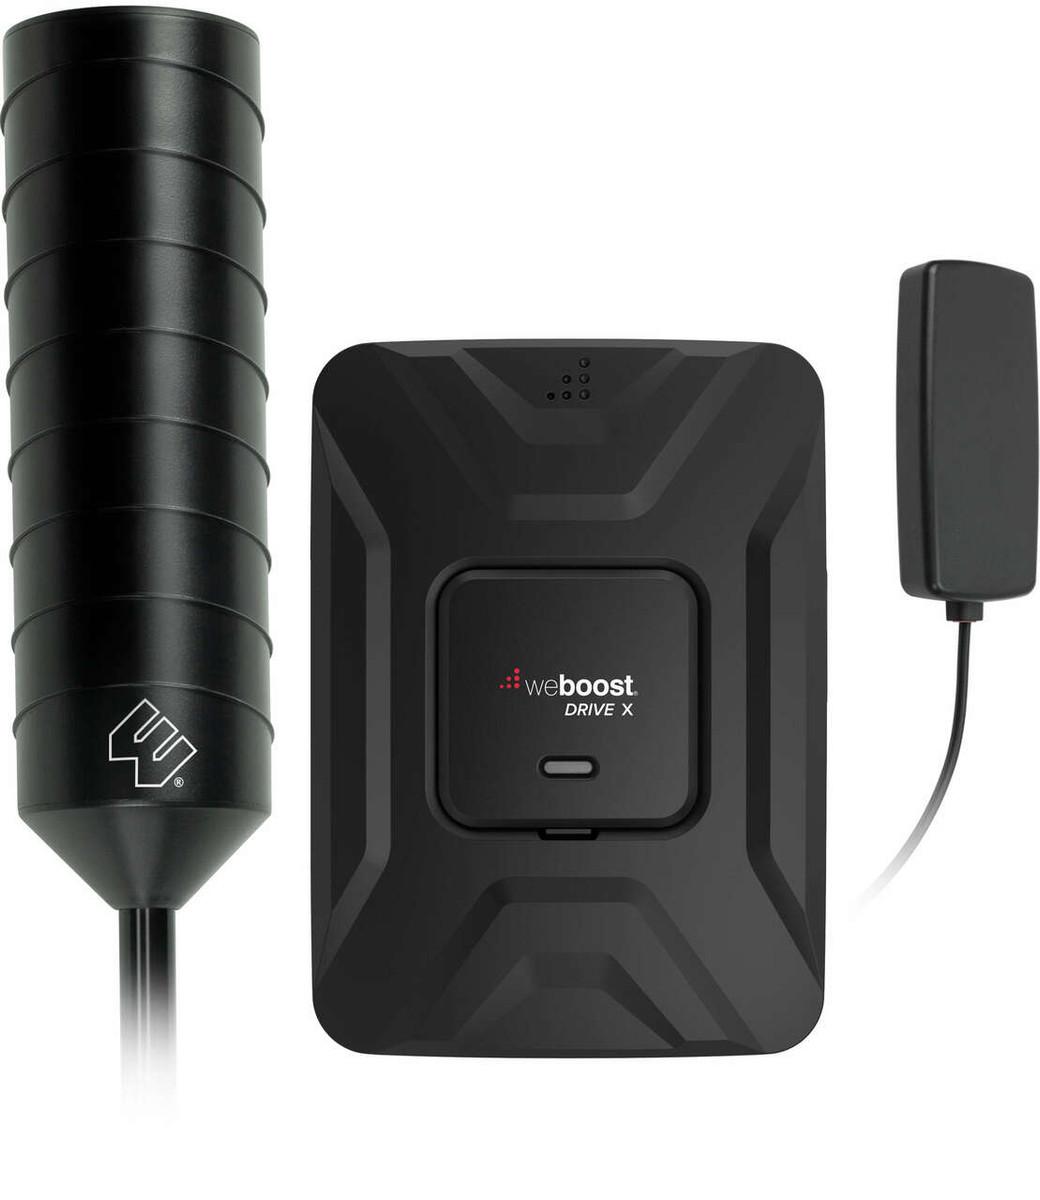 weBoost Drive X OTR Fleet Cell Phone Booster Kit | 654021